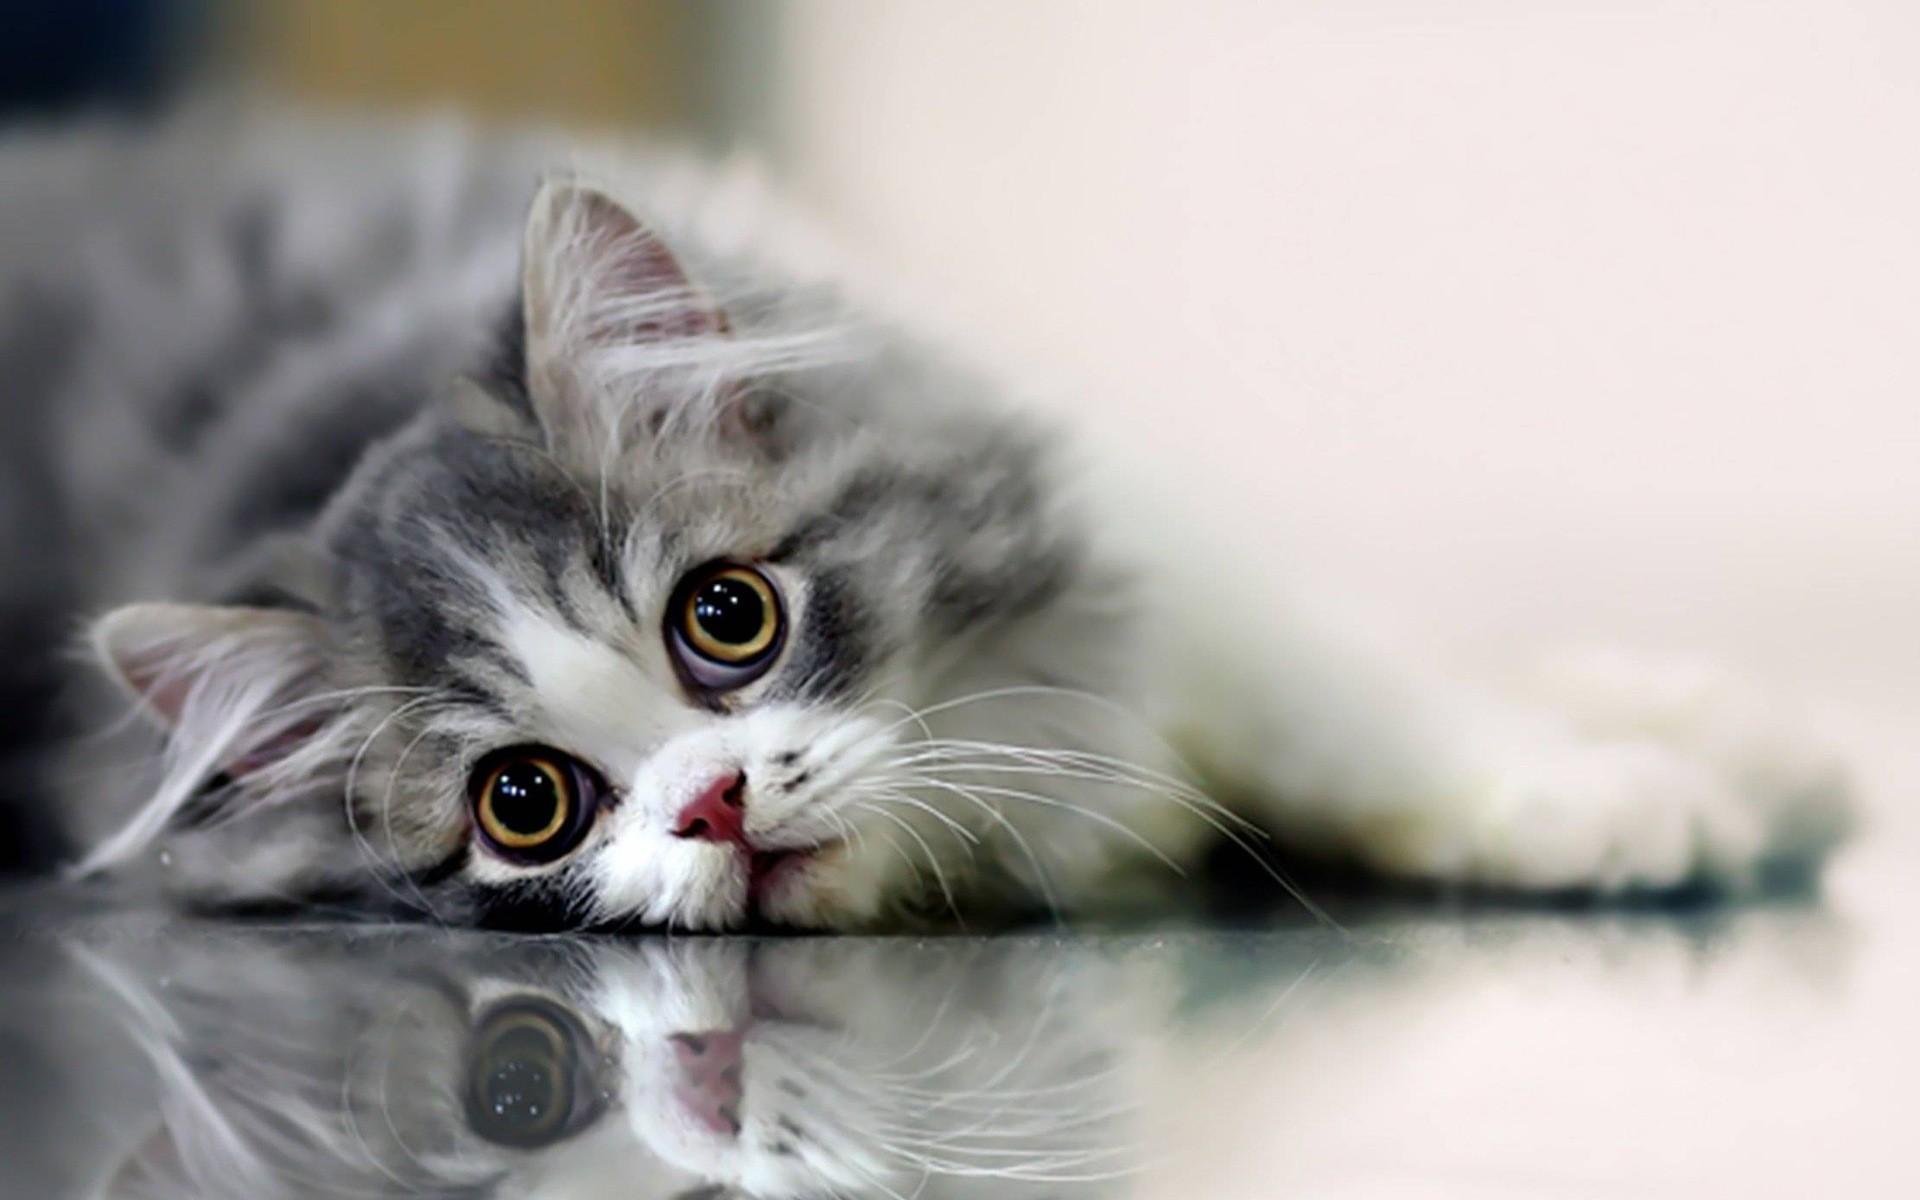 Cat hd wallpapers 1080p 64 images - Caterpillar wallpaper ...